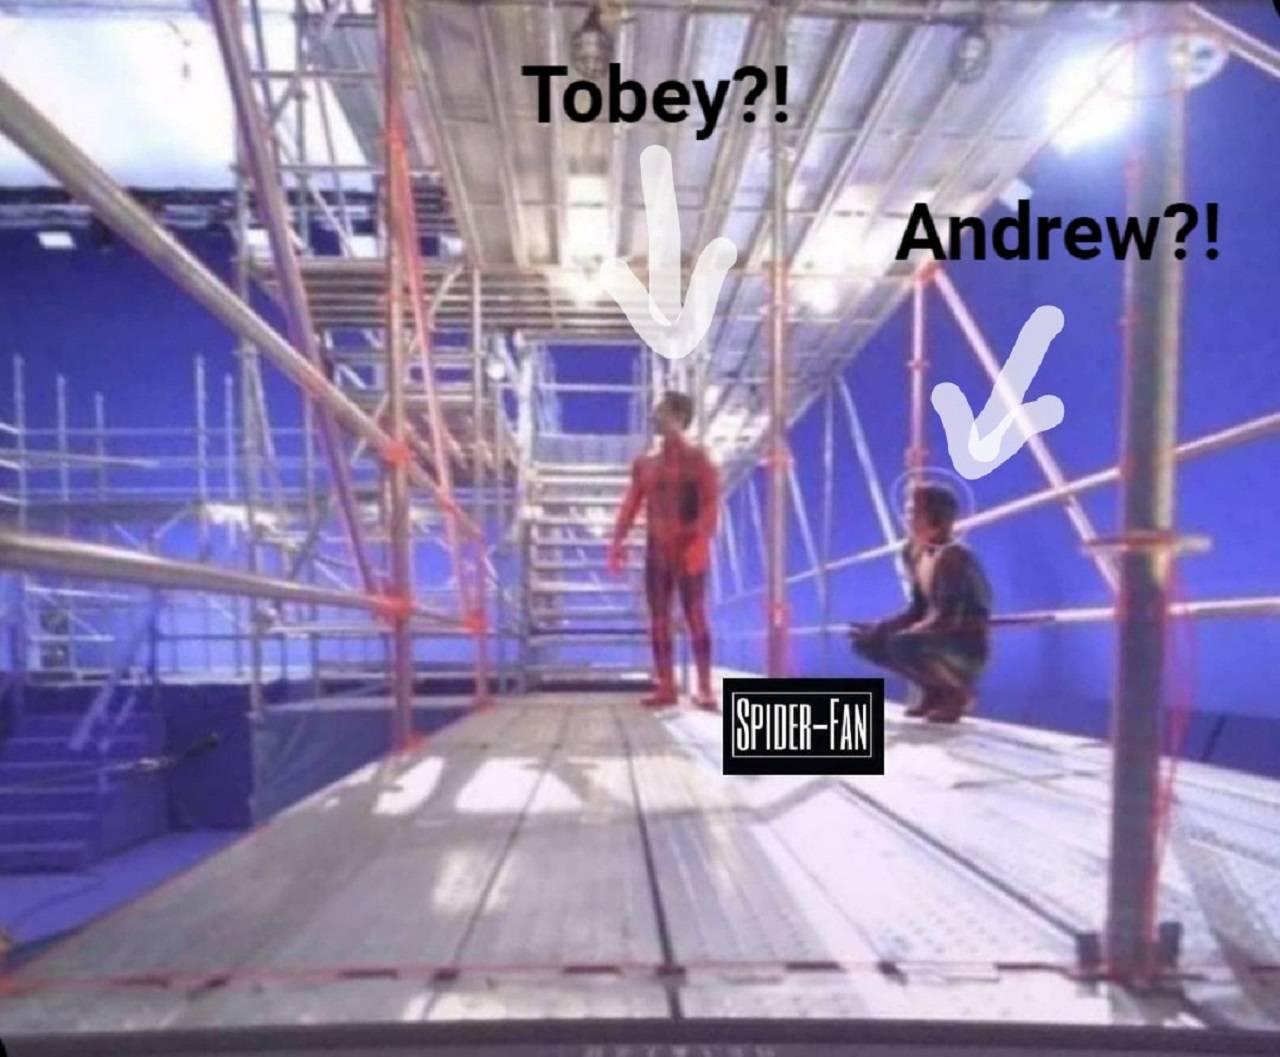 Tobey Maguire Andrew Garfield Spider-Man 3 Imágenes de Spider-Man 3